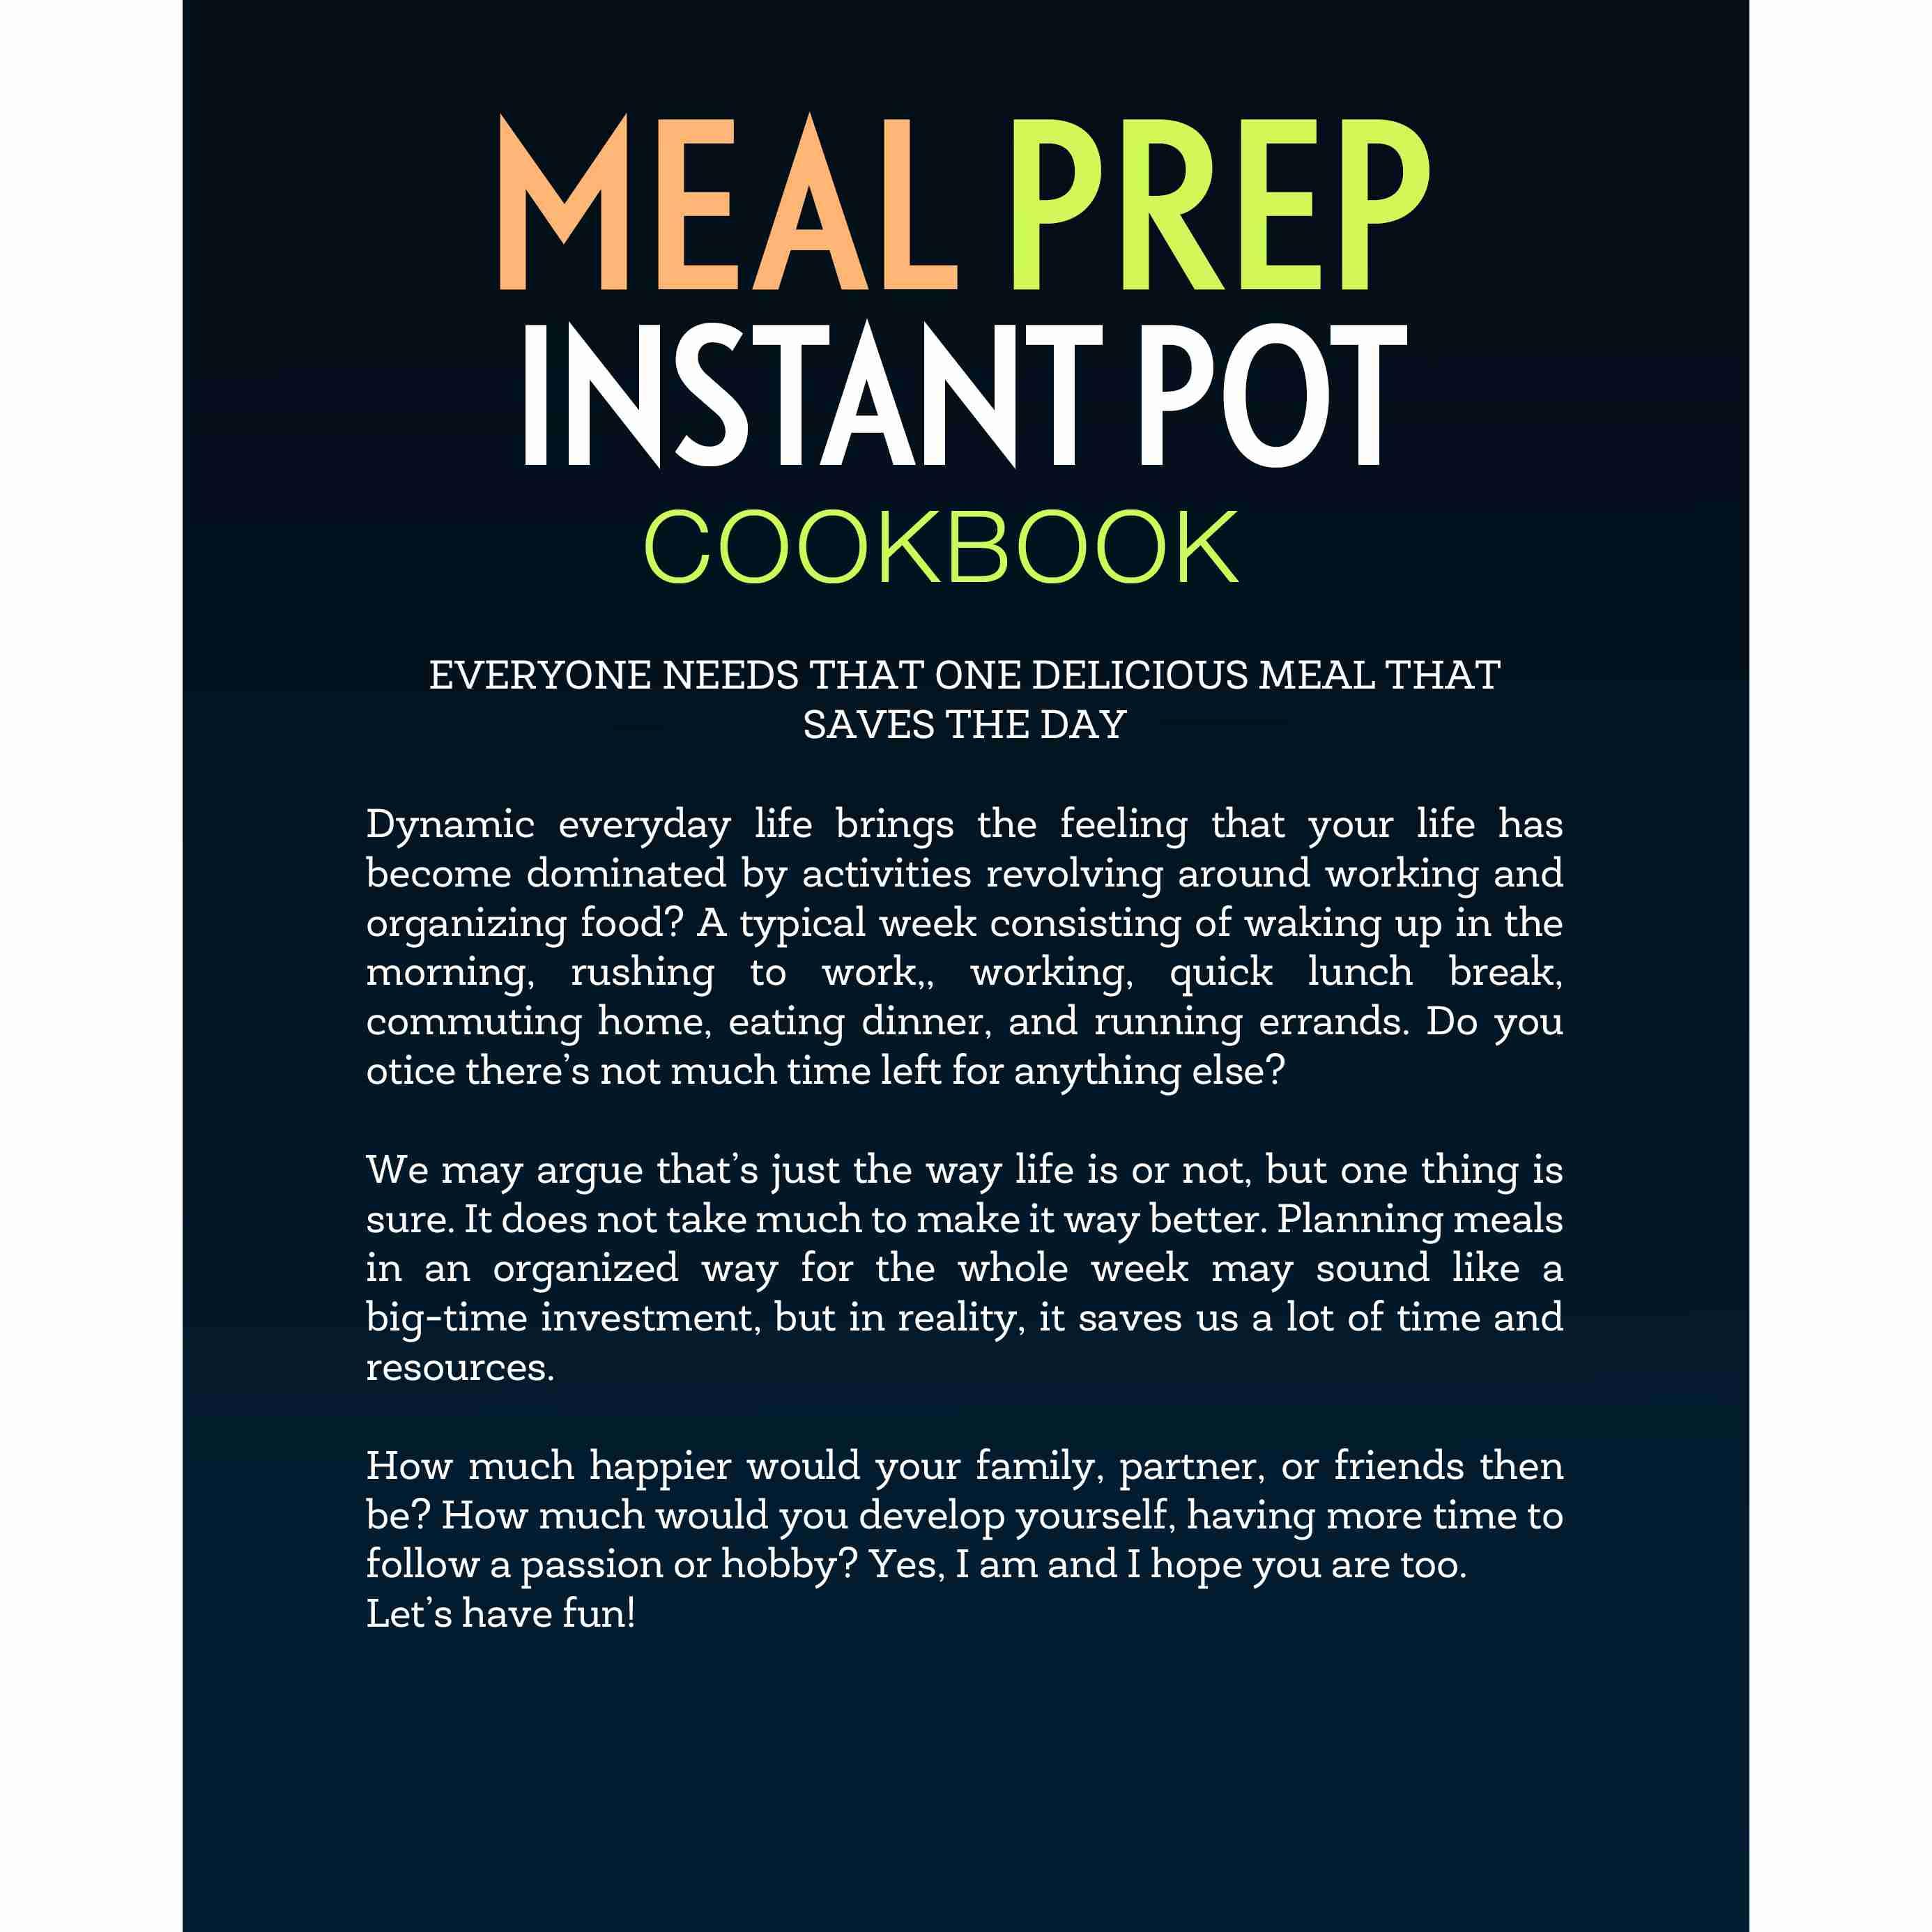 meal-prep-cookbooks for cheap